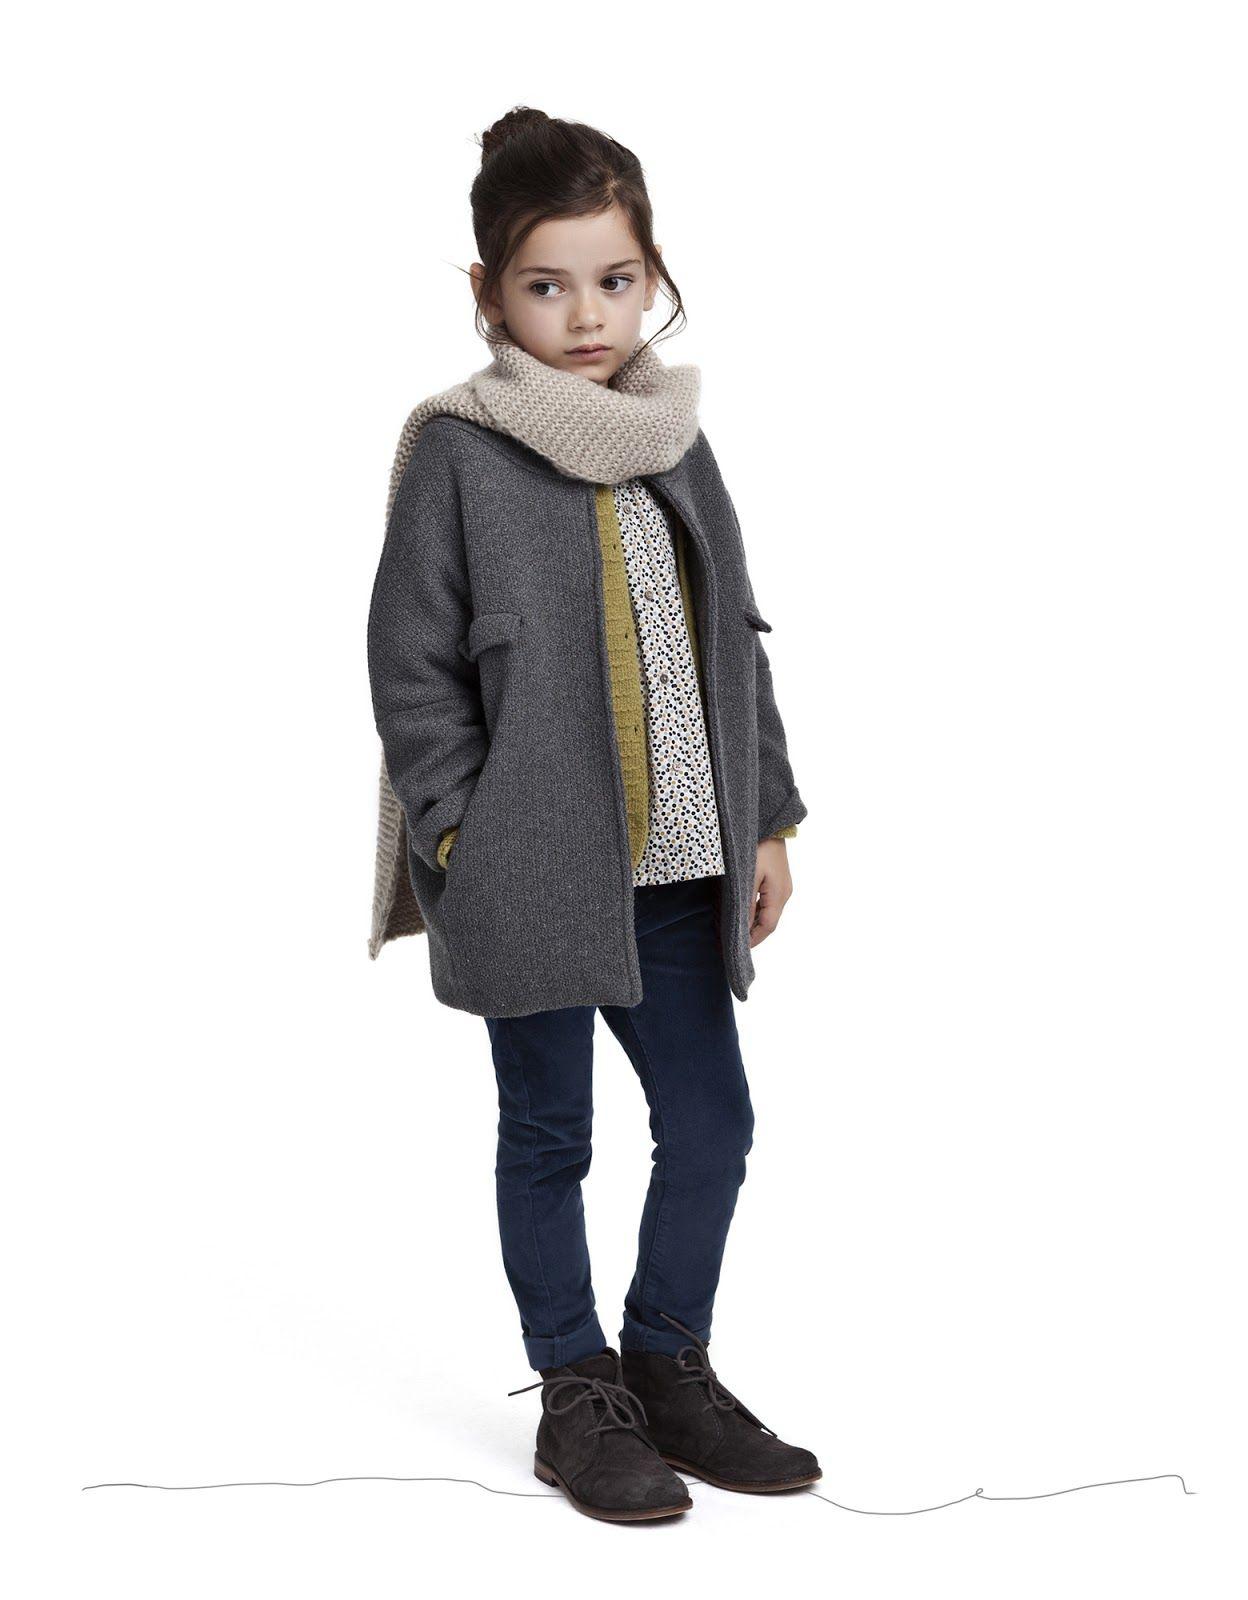 Zara Kids Studio AW12 | blackPEPPER kleintes | Zara kids ...